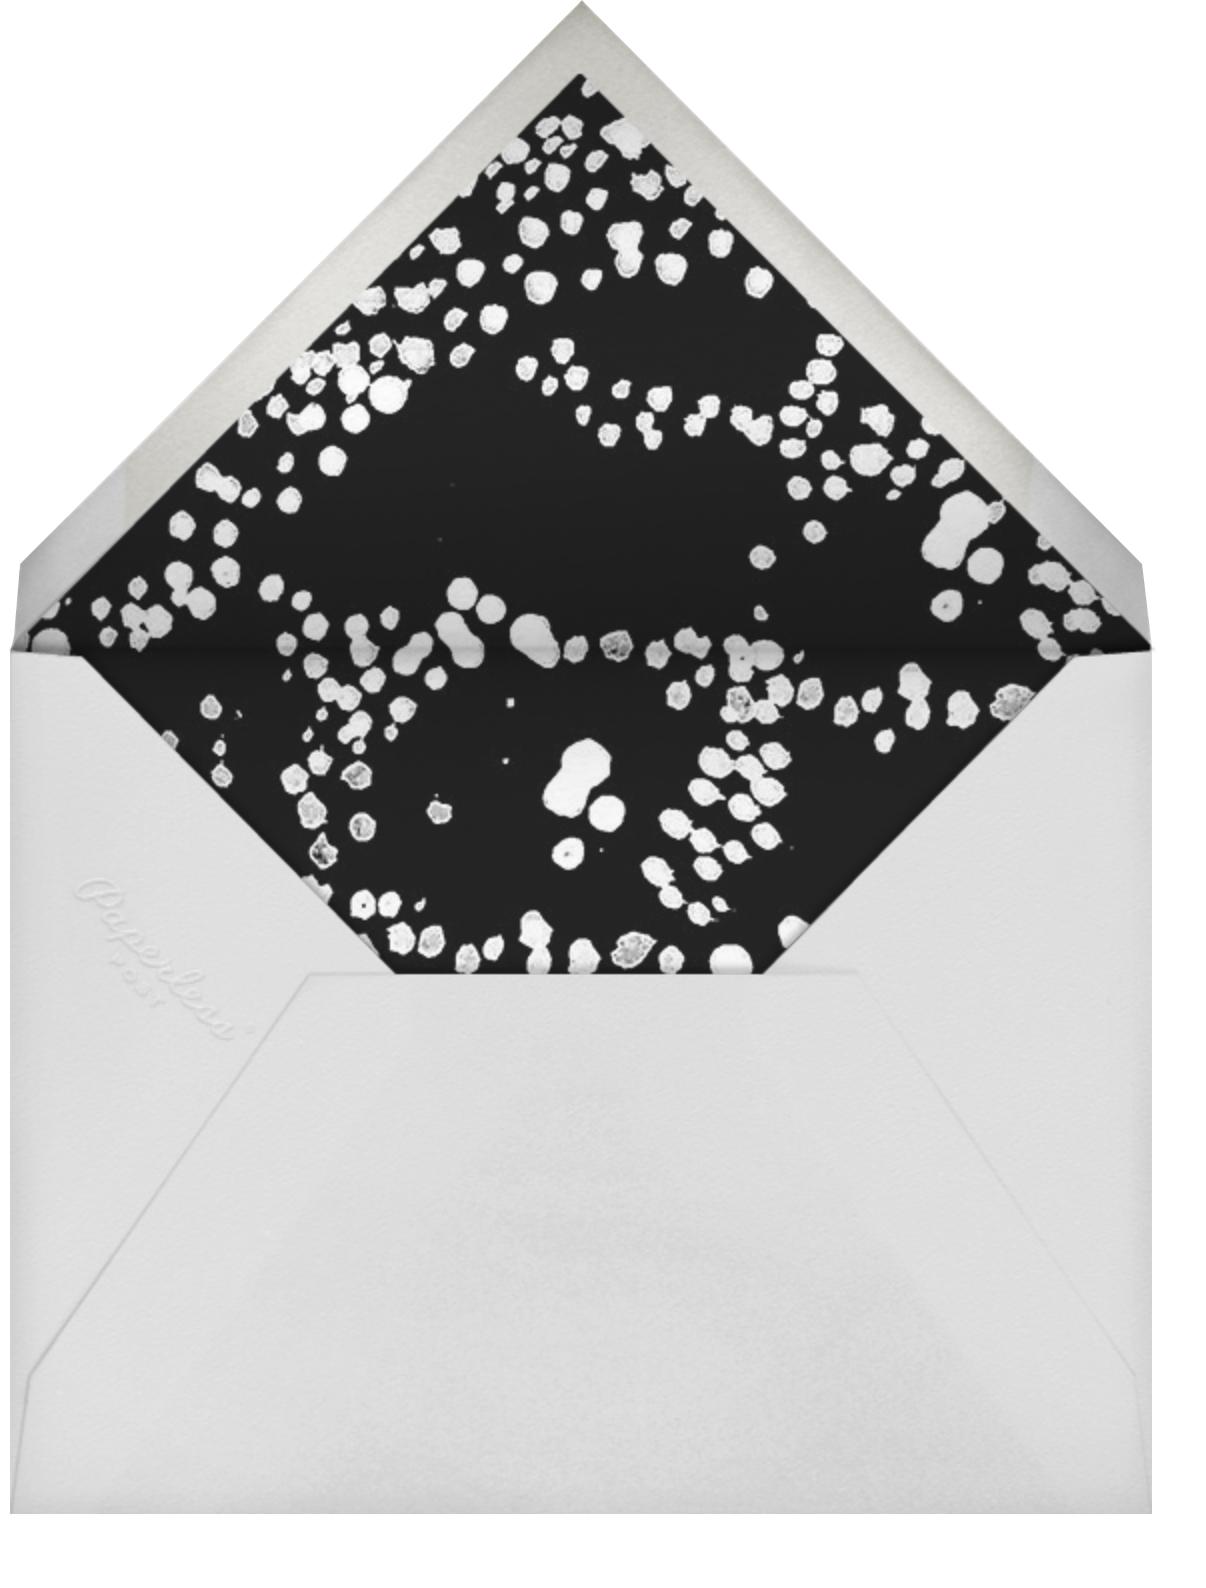 Evoke (Square Photo) - Gold - Kelly Wearstler - Graduation party - envelope back